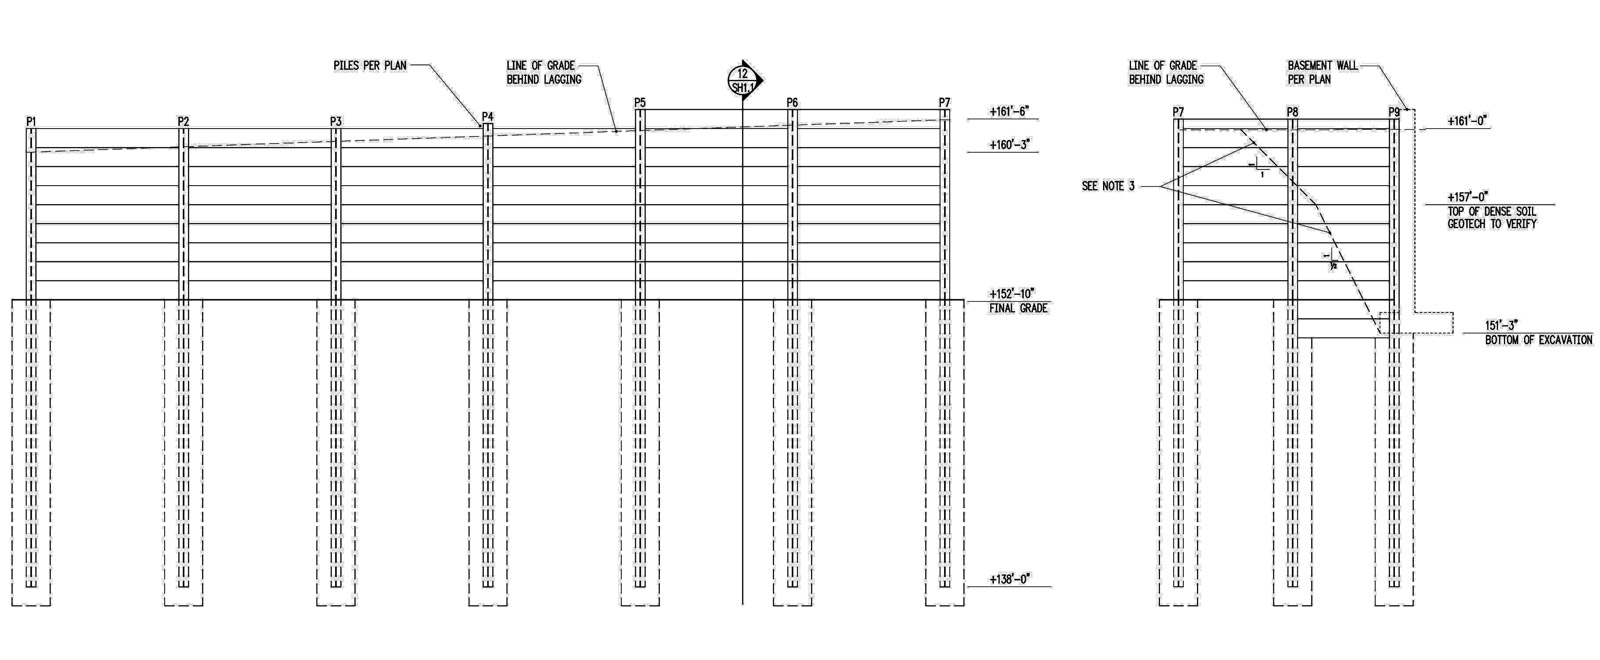 1999 toyota corolla alternator wiring diagram